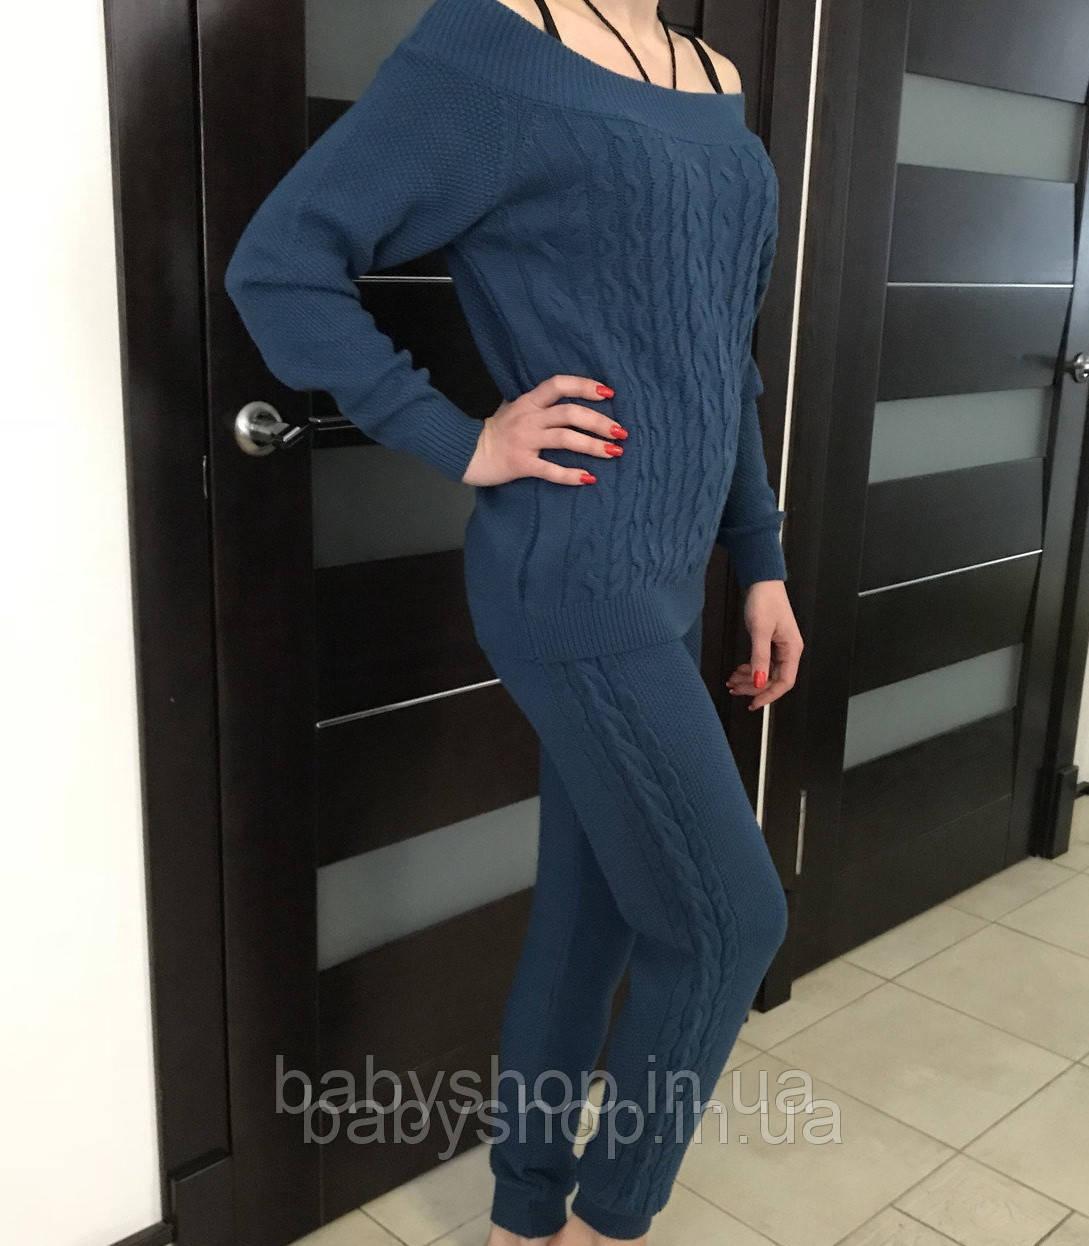 Женский костюм. Турция. 2. Размер 42-44